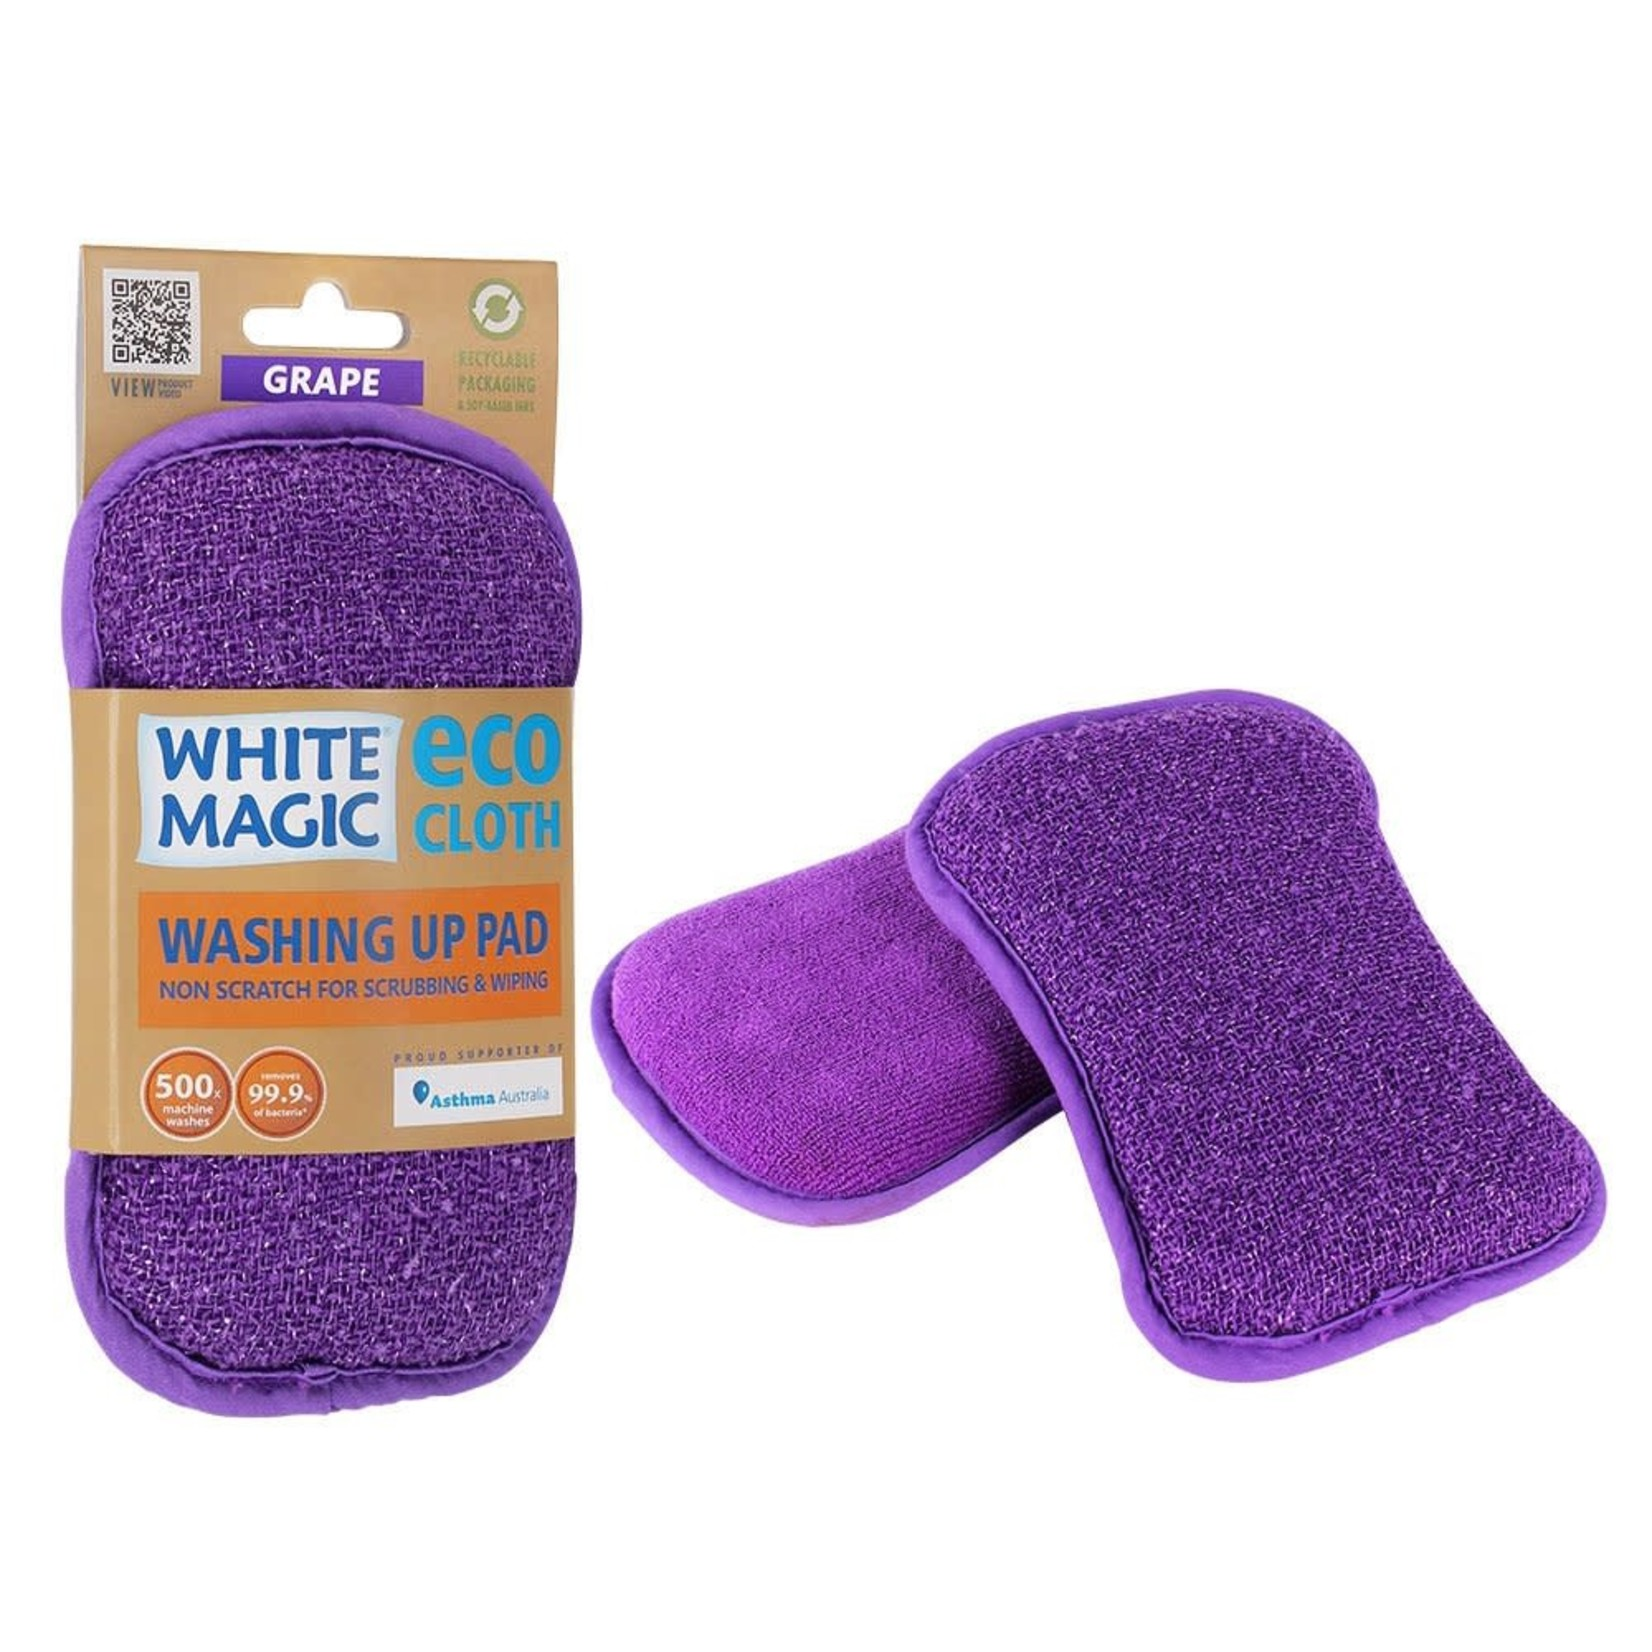 White Magic White Magic Washing Up Pad